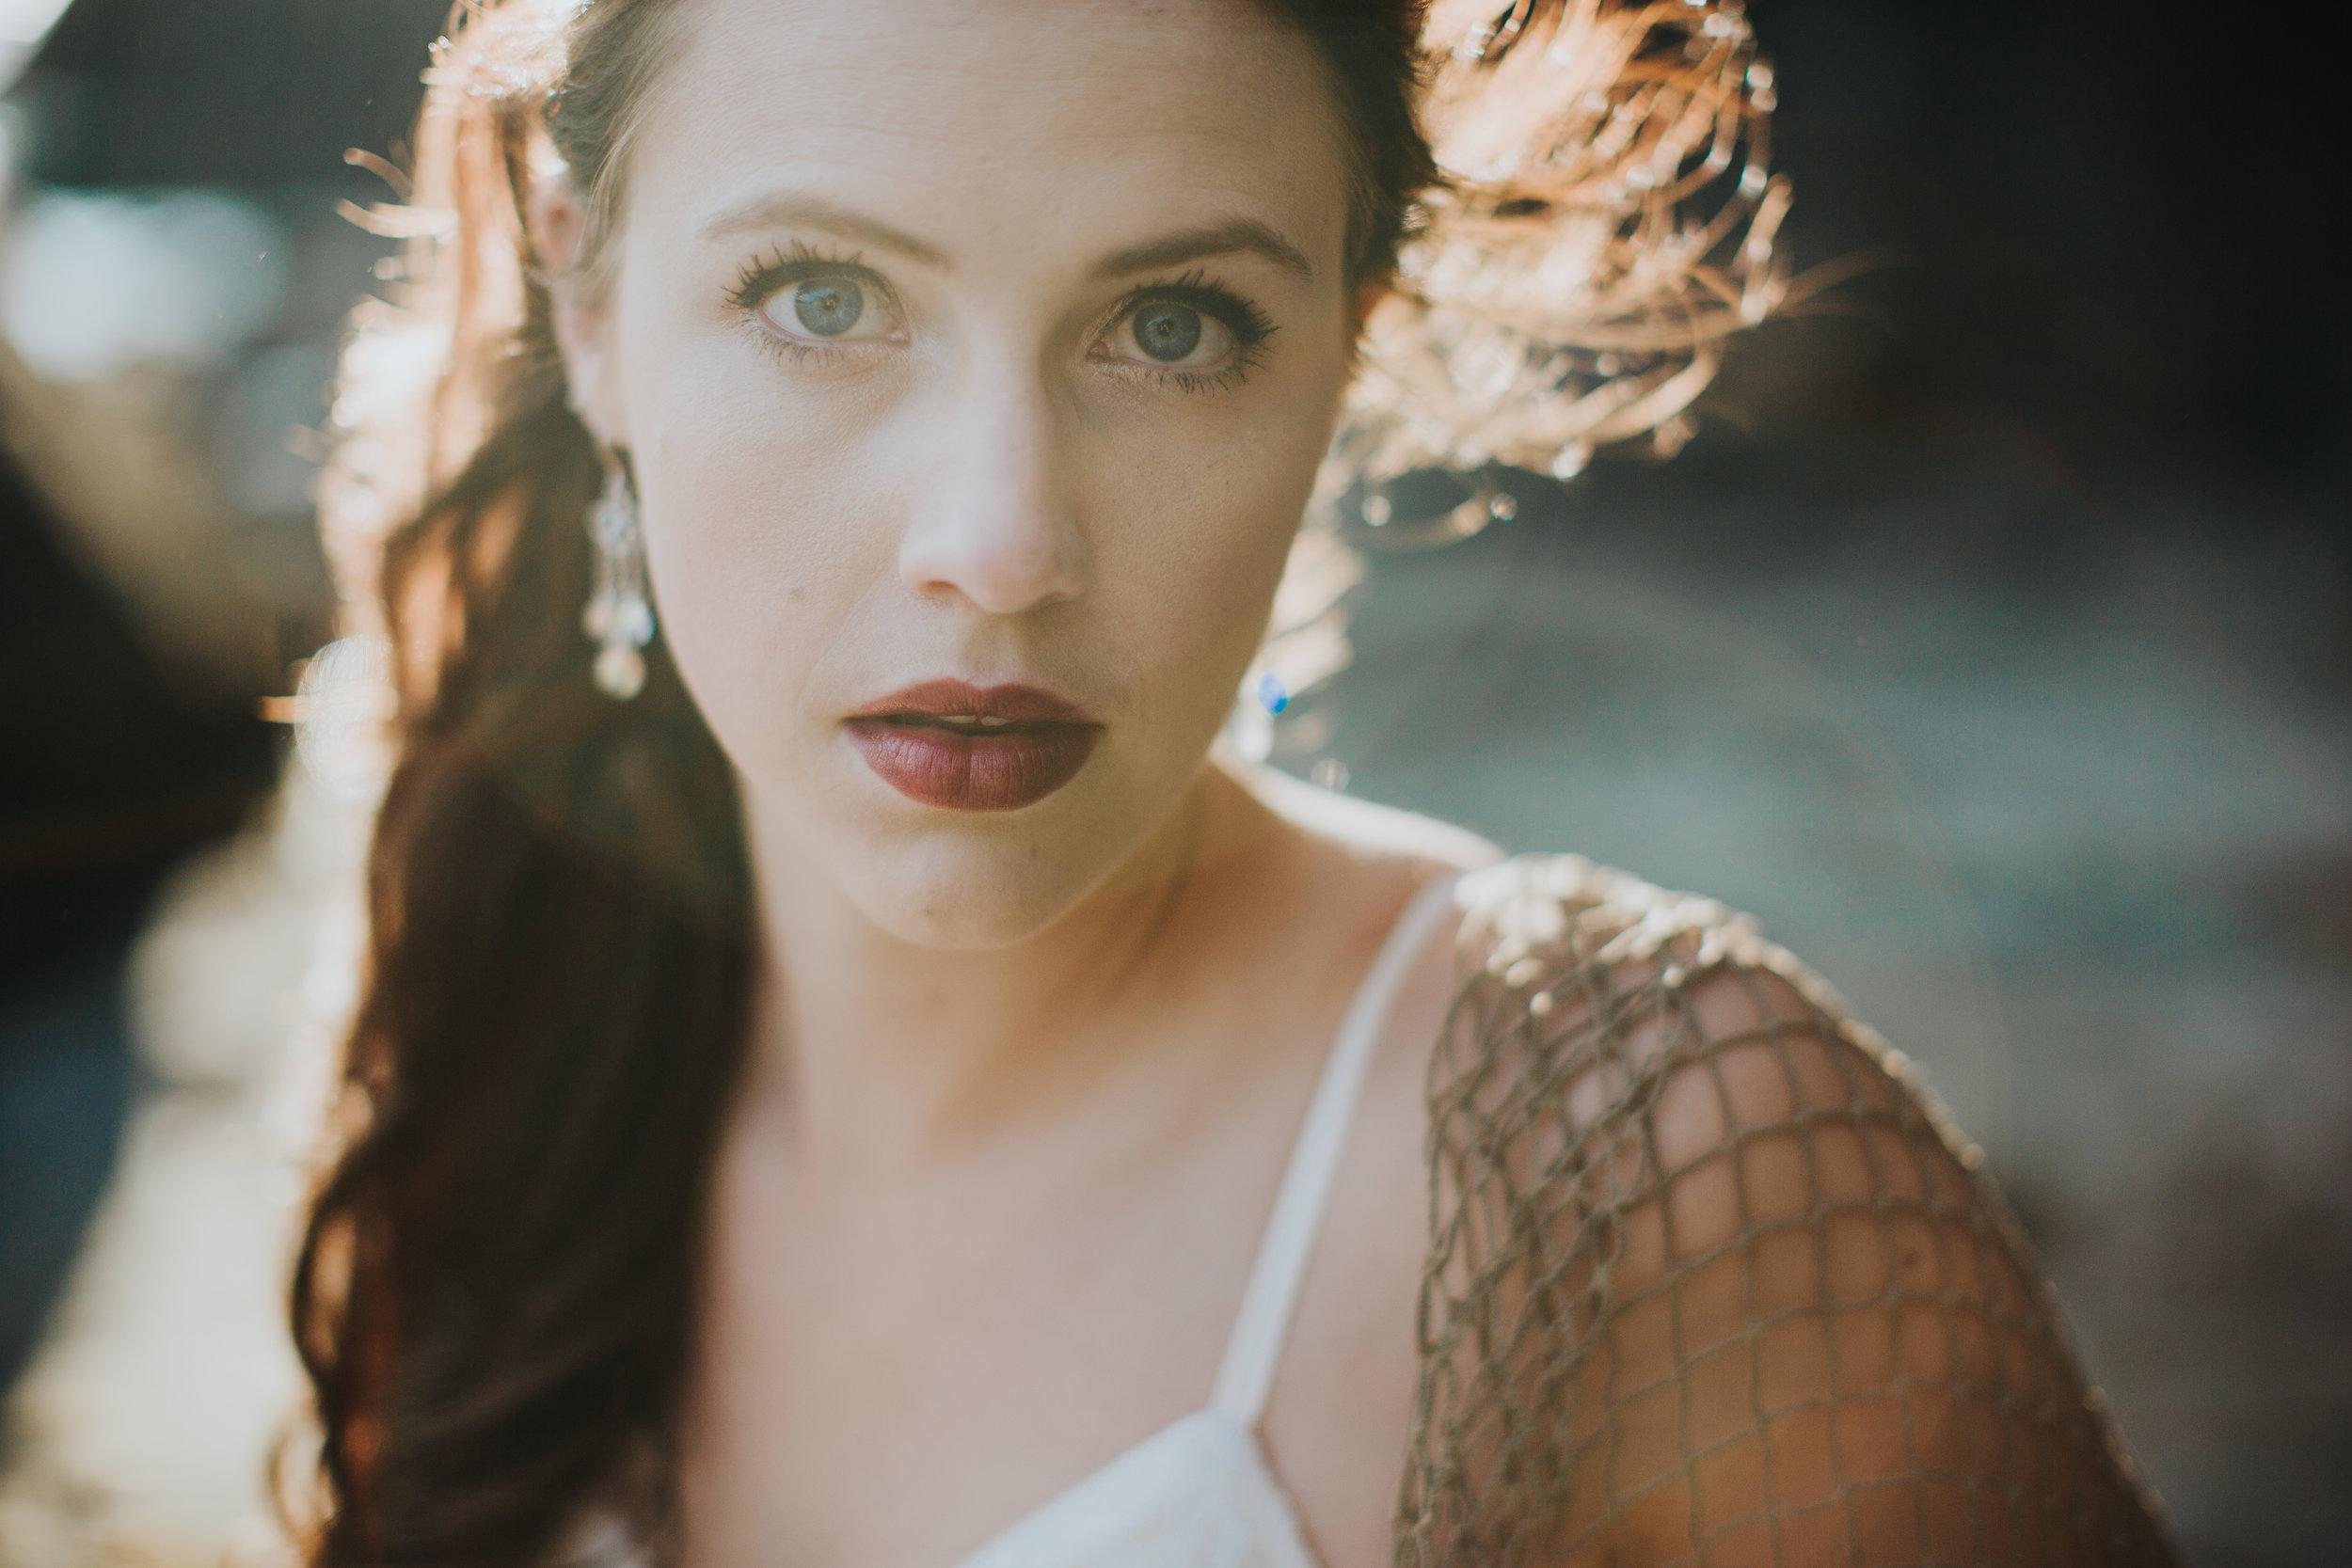 Port-Angeles-Salt-Creek-beach-wedding-bride-PNW-olympic-peninsula-photographer-Kayla-Dawn-Photography-outdoors-golden-hour-dancer-dress (27).jpg